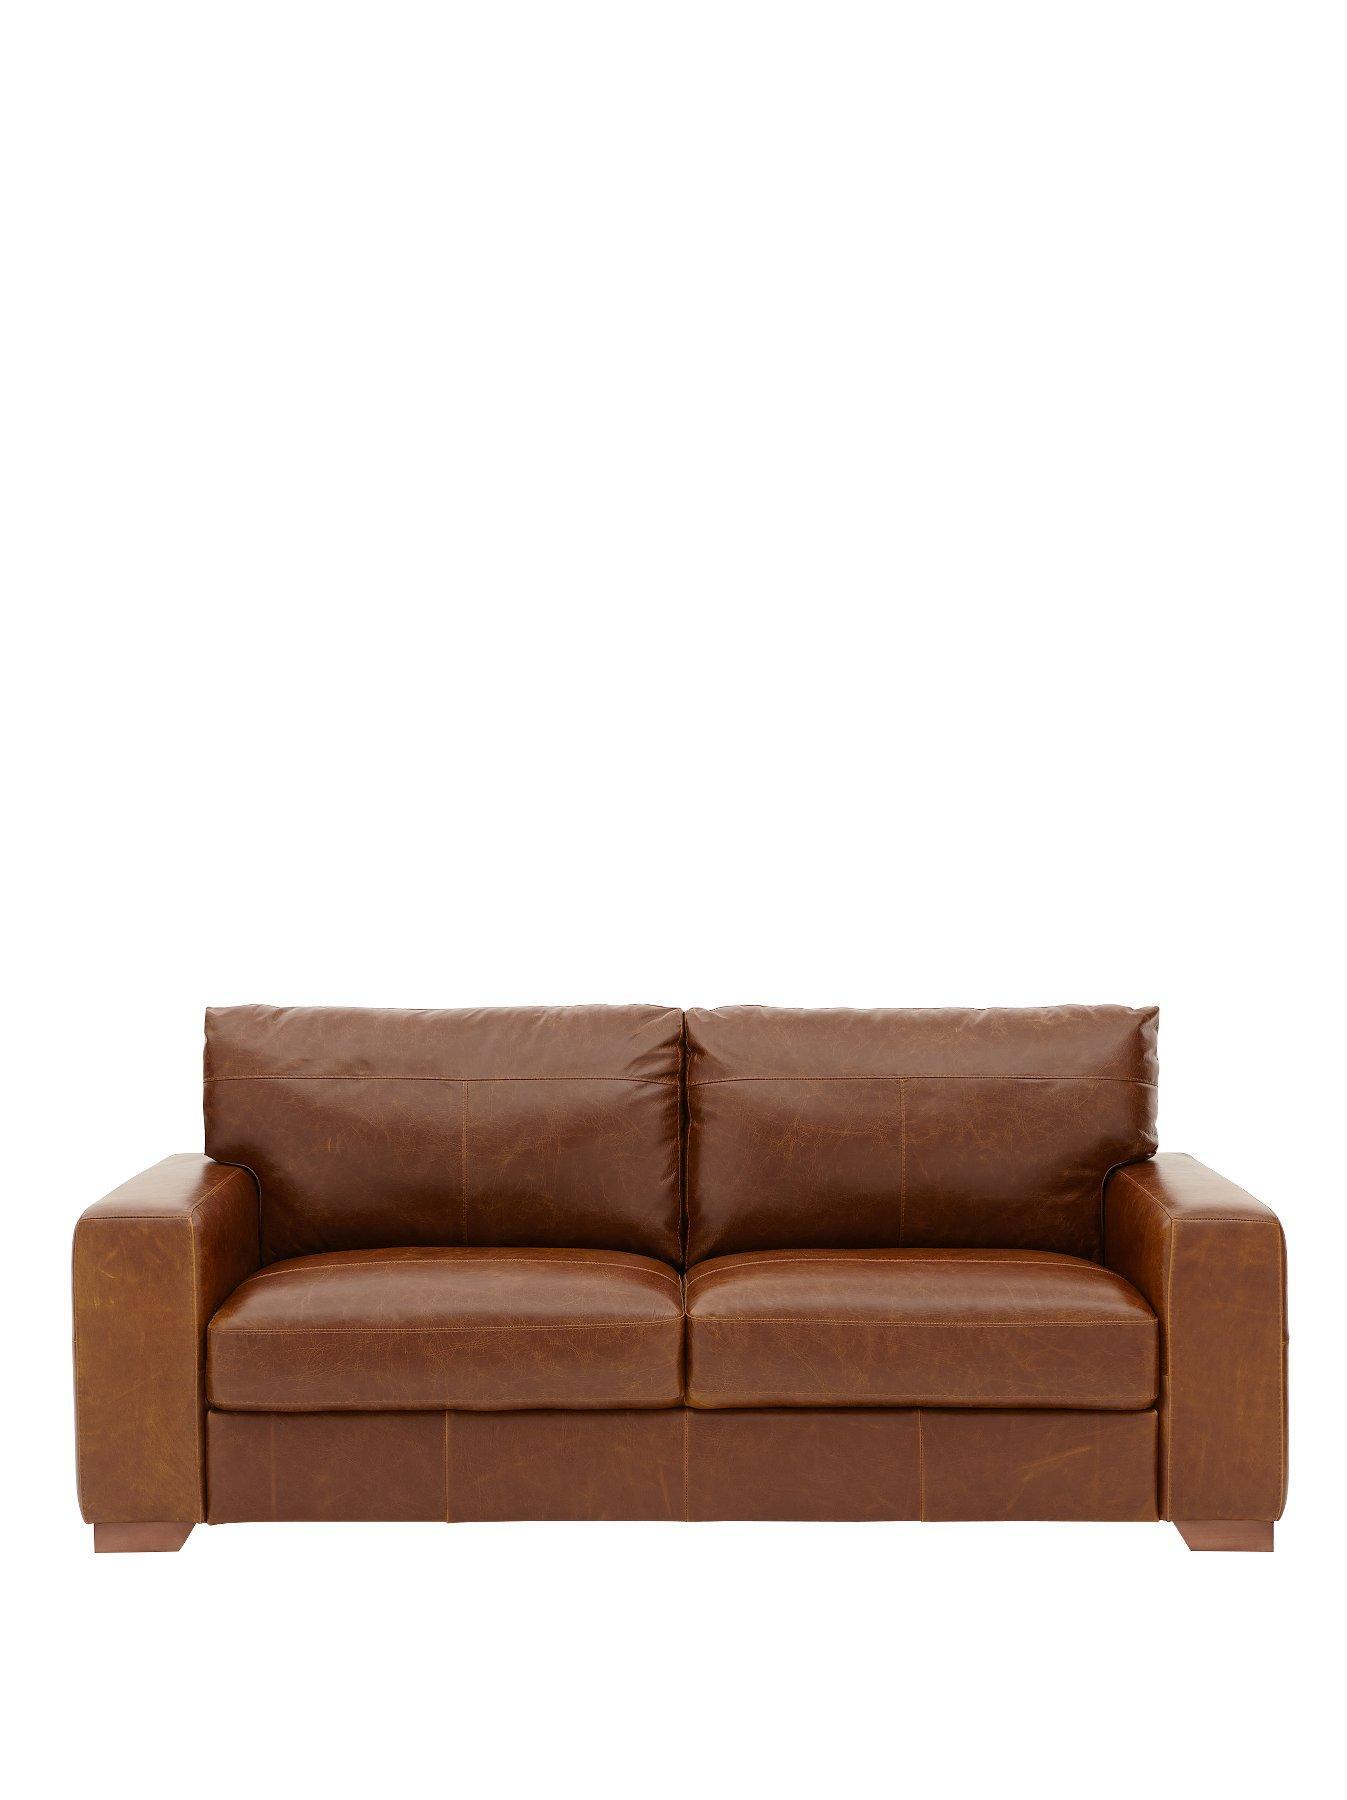 Huntington 3 Seater Italian Leather Sofa | Very.co.uk